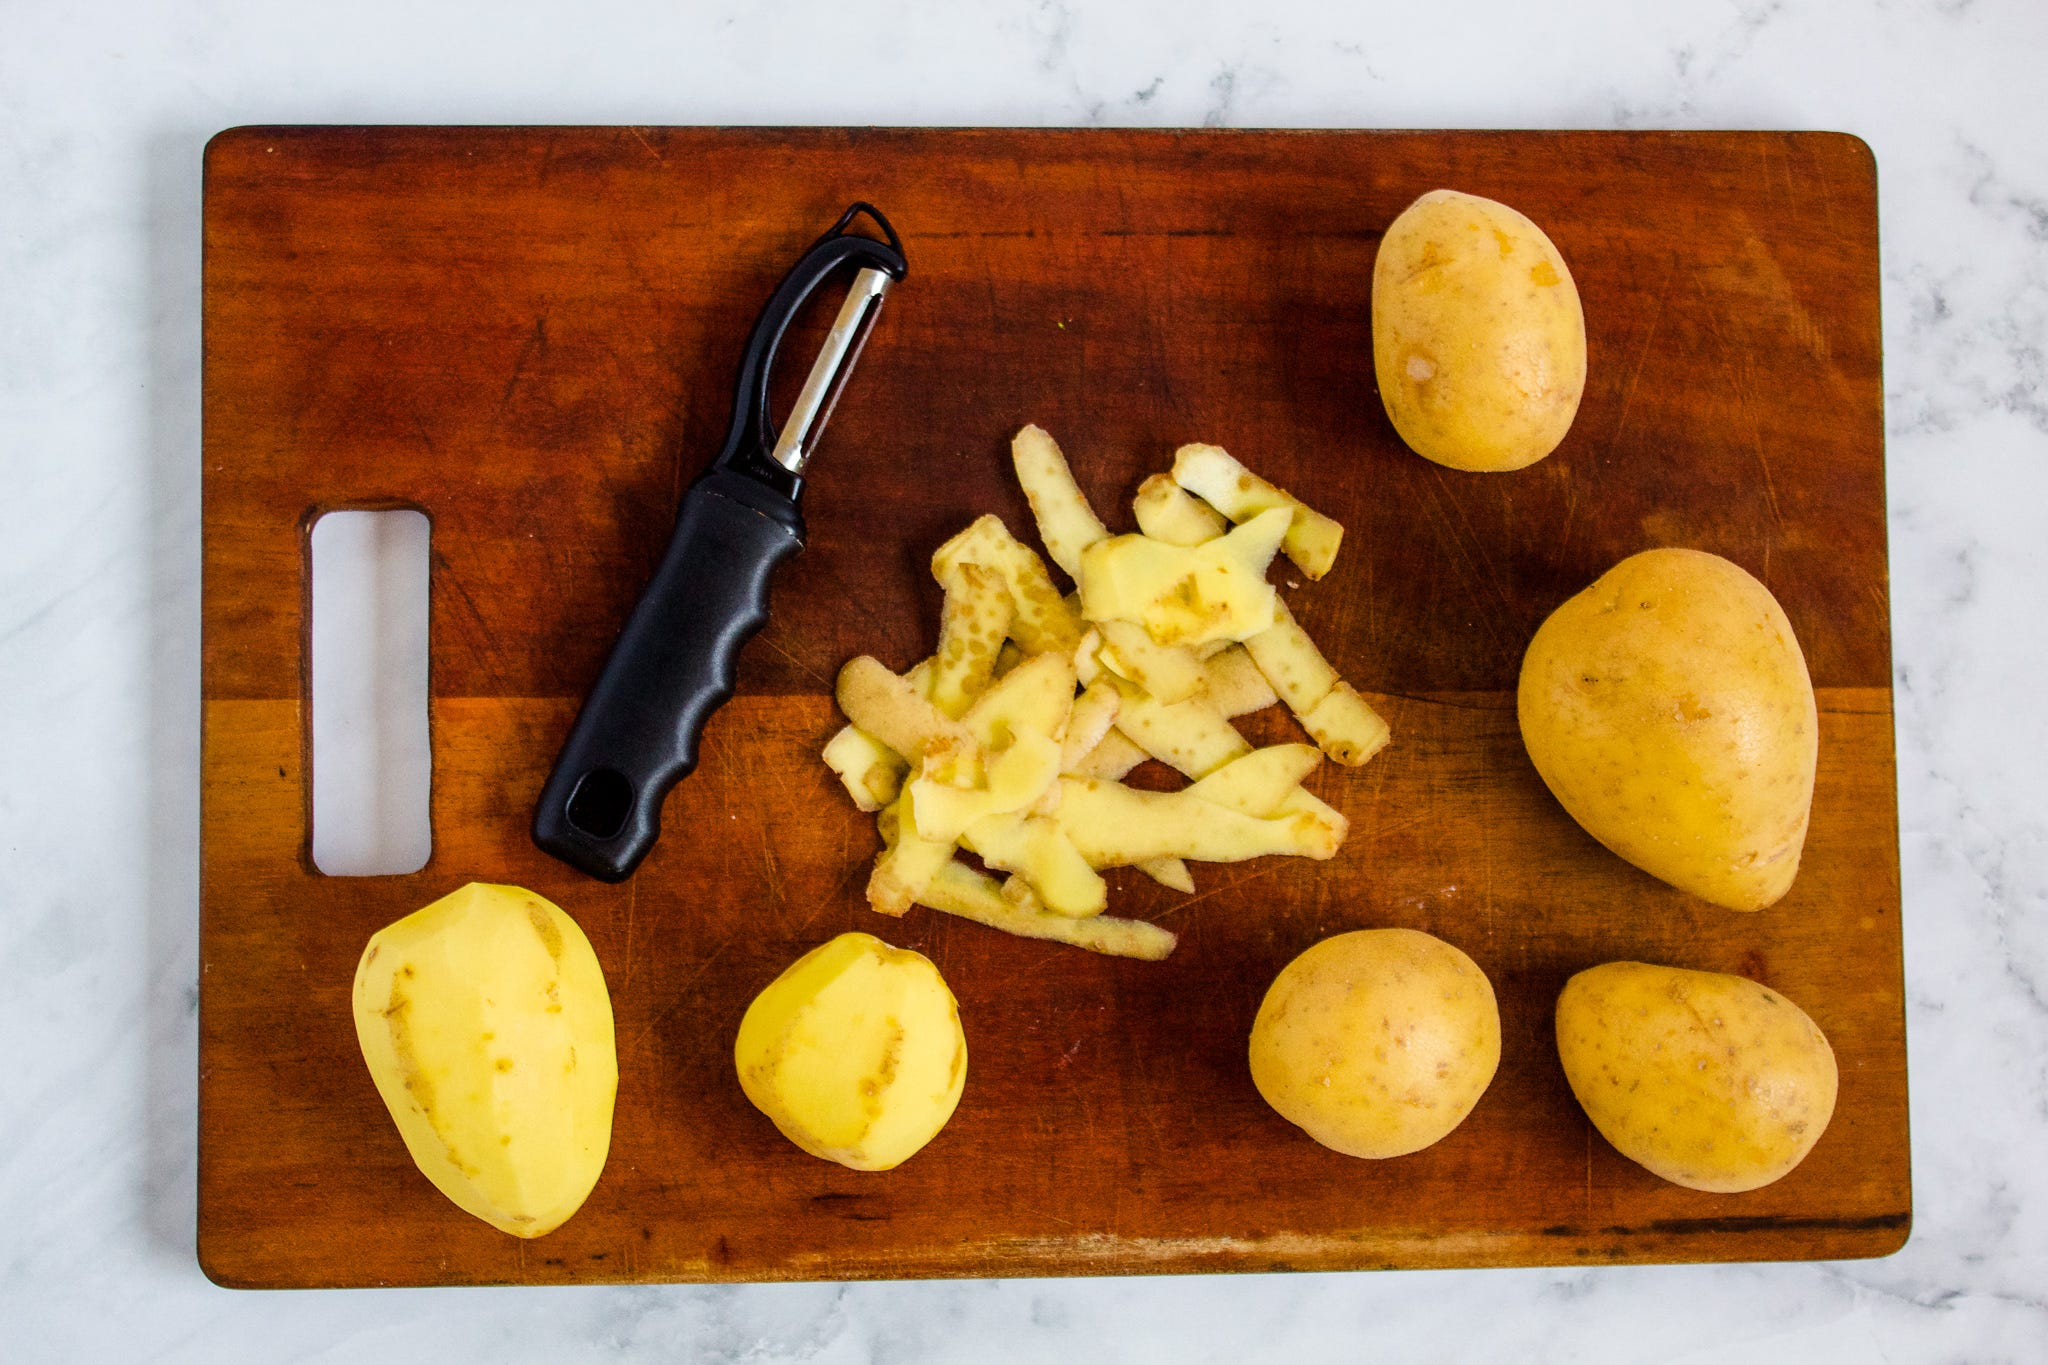 Peeled and sliced Yukon Gold potatoes on a cutting board.